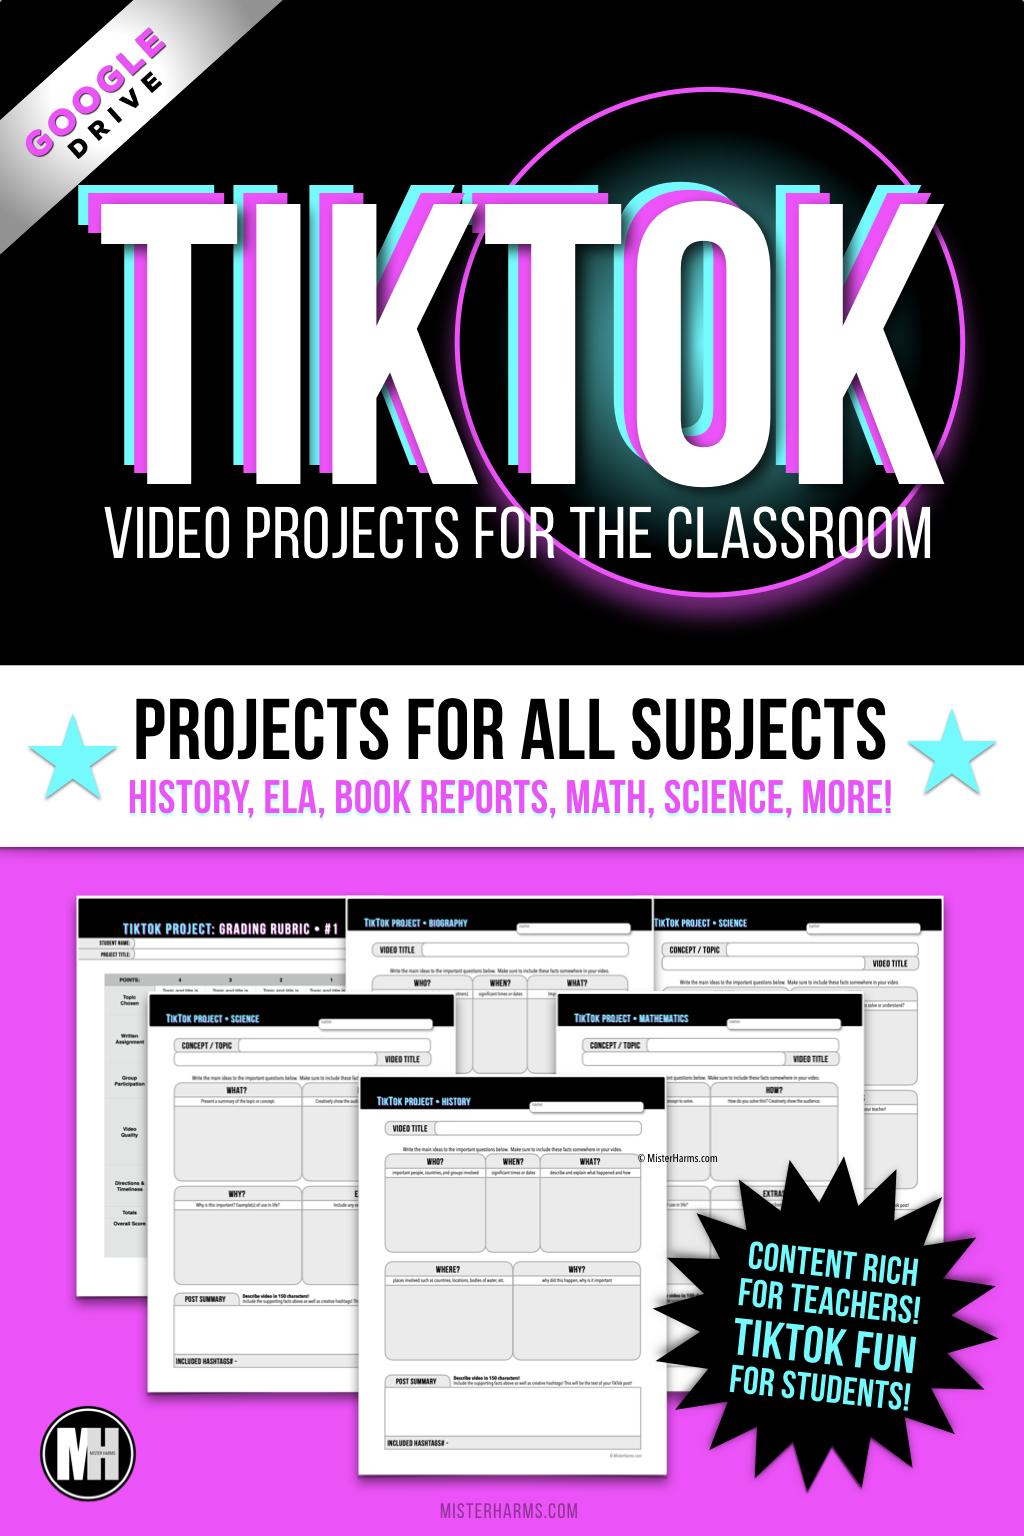 Tiktok In The Classroom First Year Teaching Social Studies Classroom Middle School Classroom